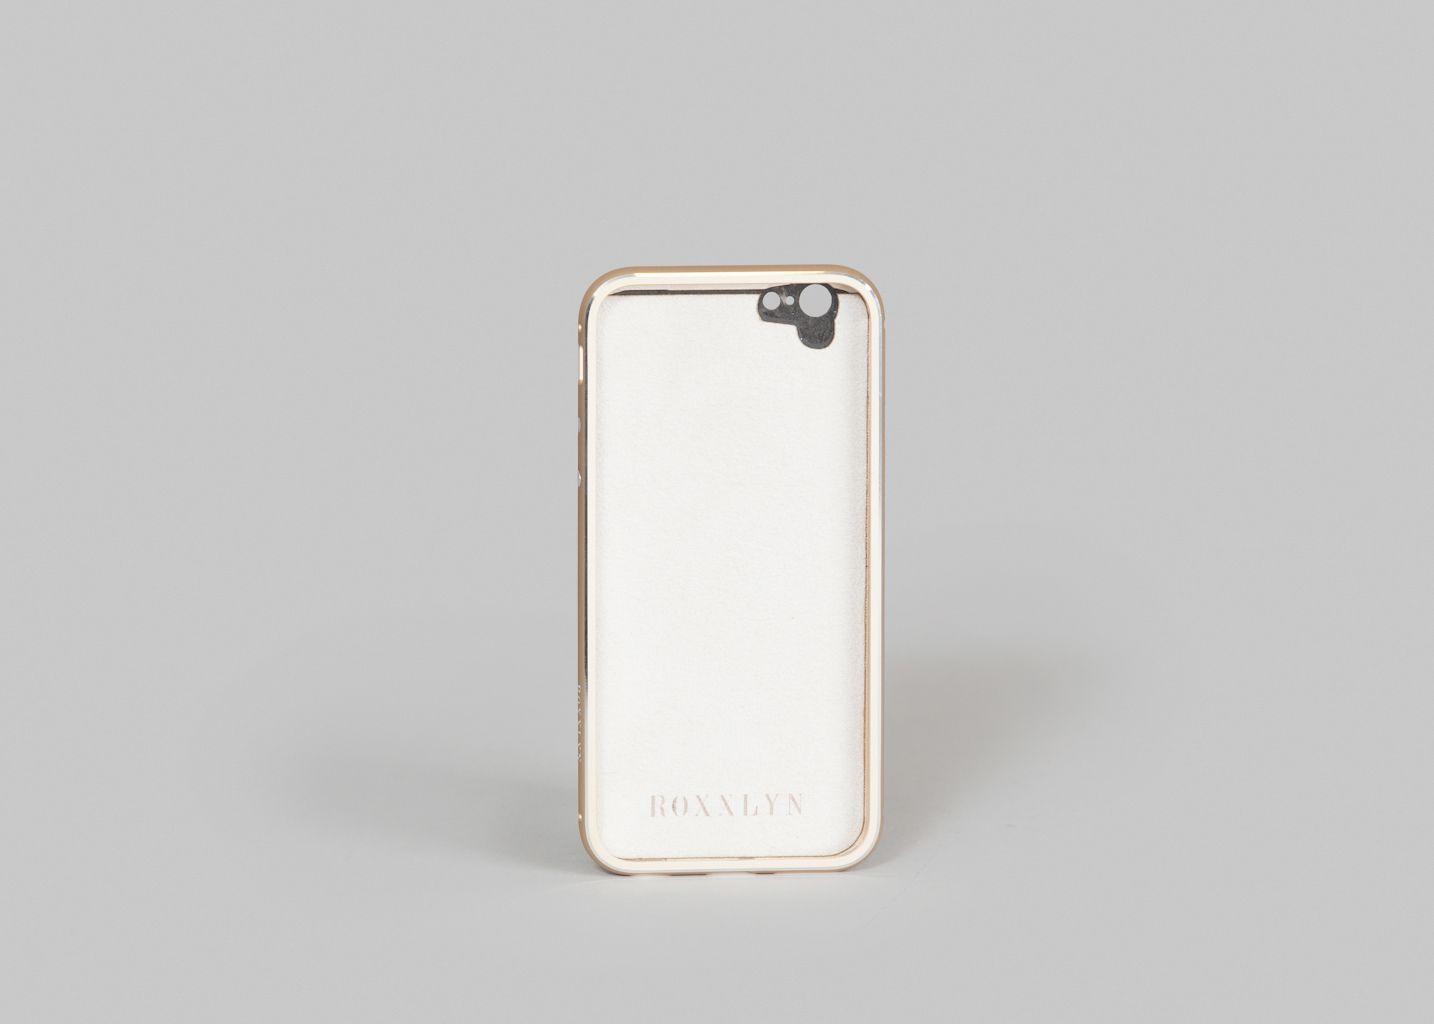 Coque iPhone 6 Marple Red - Roxxlyn